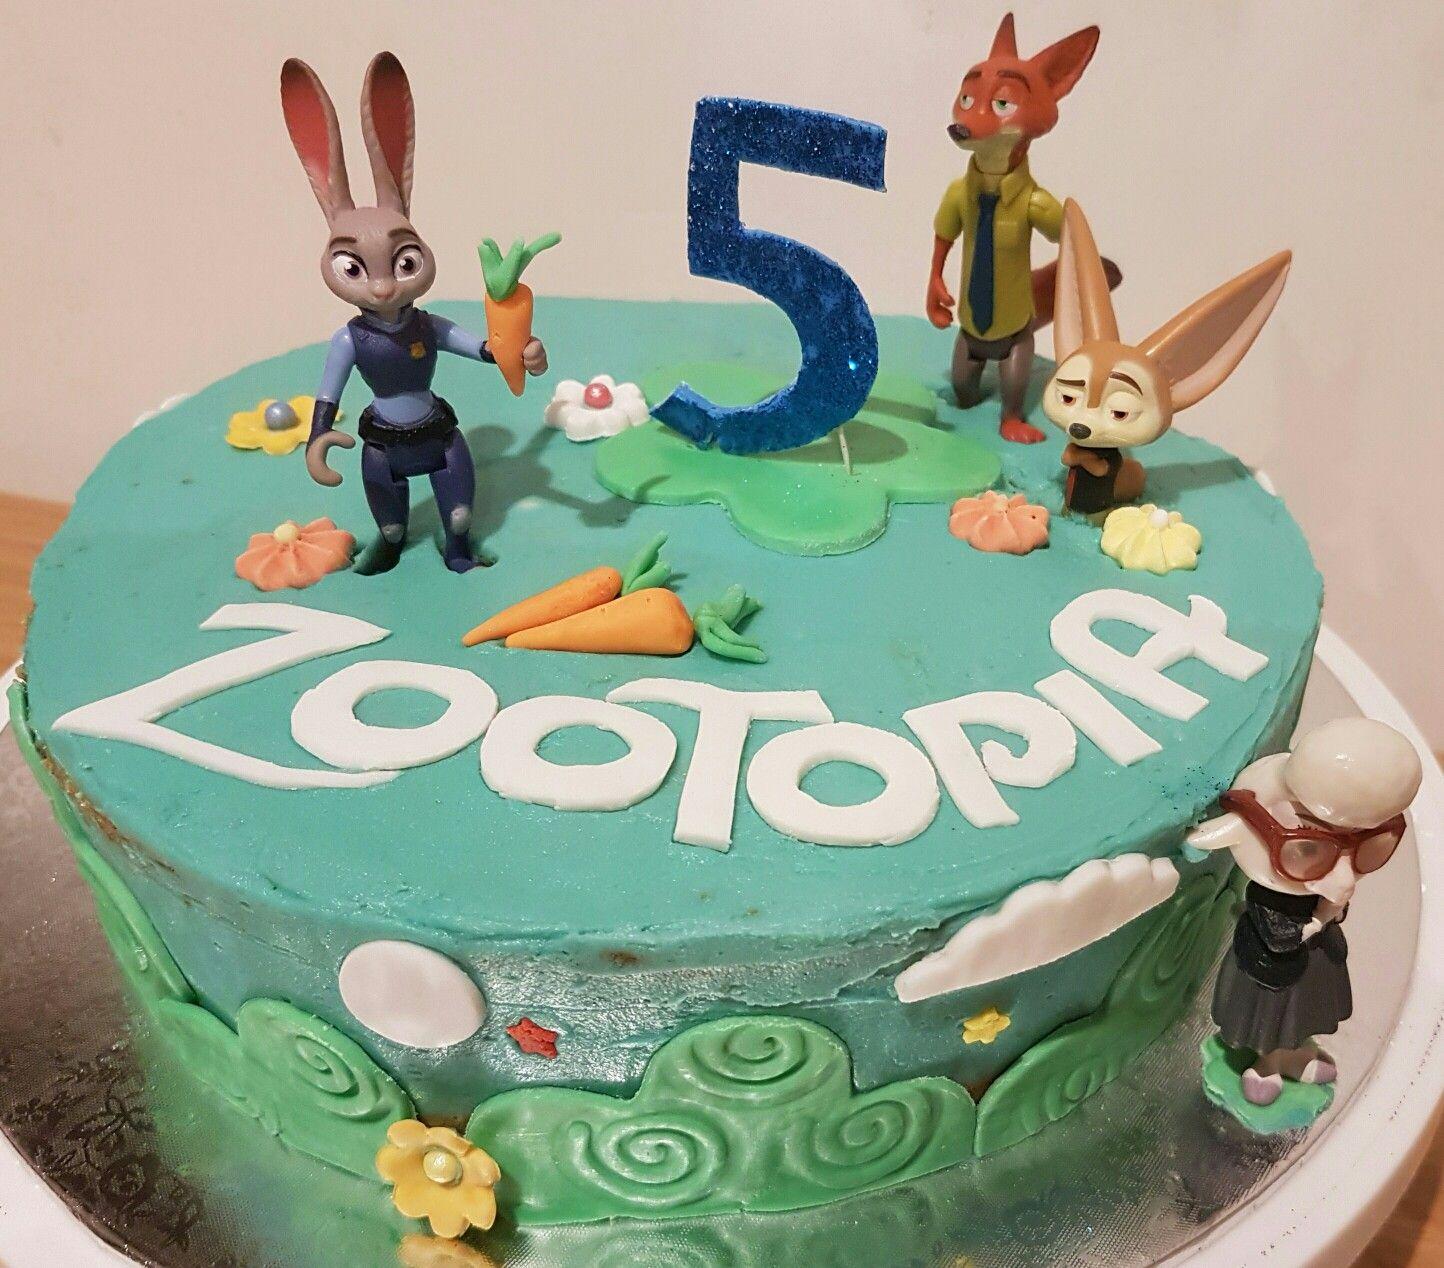 Character Birthday Cakes Near Me